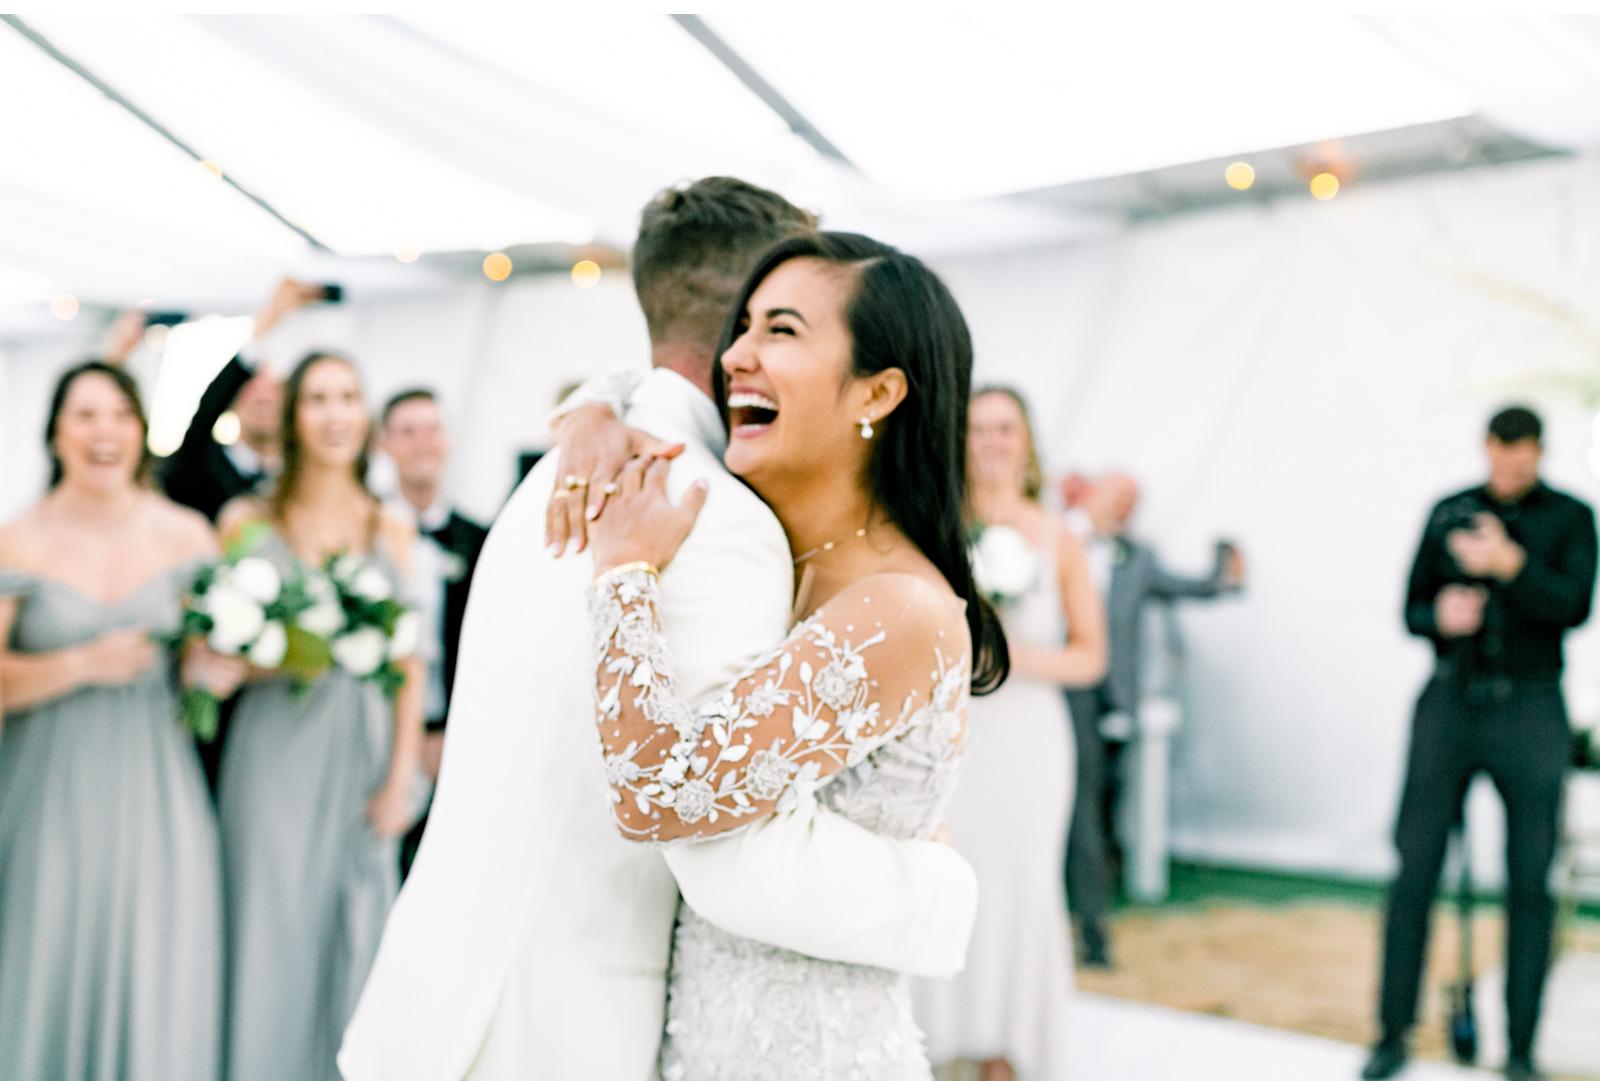 Southern-California-Wedding-Photographer-West-Coast-Weddings-Style-Me-Pretty-Malibu-Wedding-Photographer-Natalie-Schutt-Photography_09.jpg